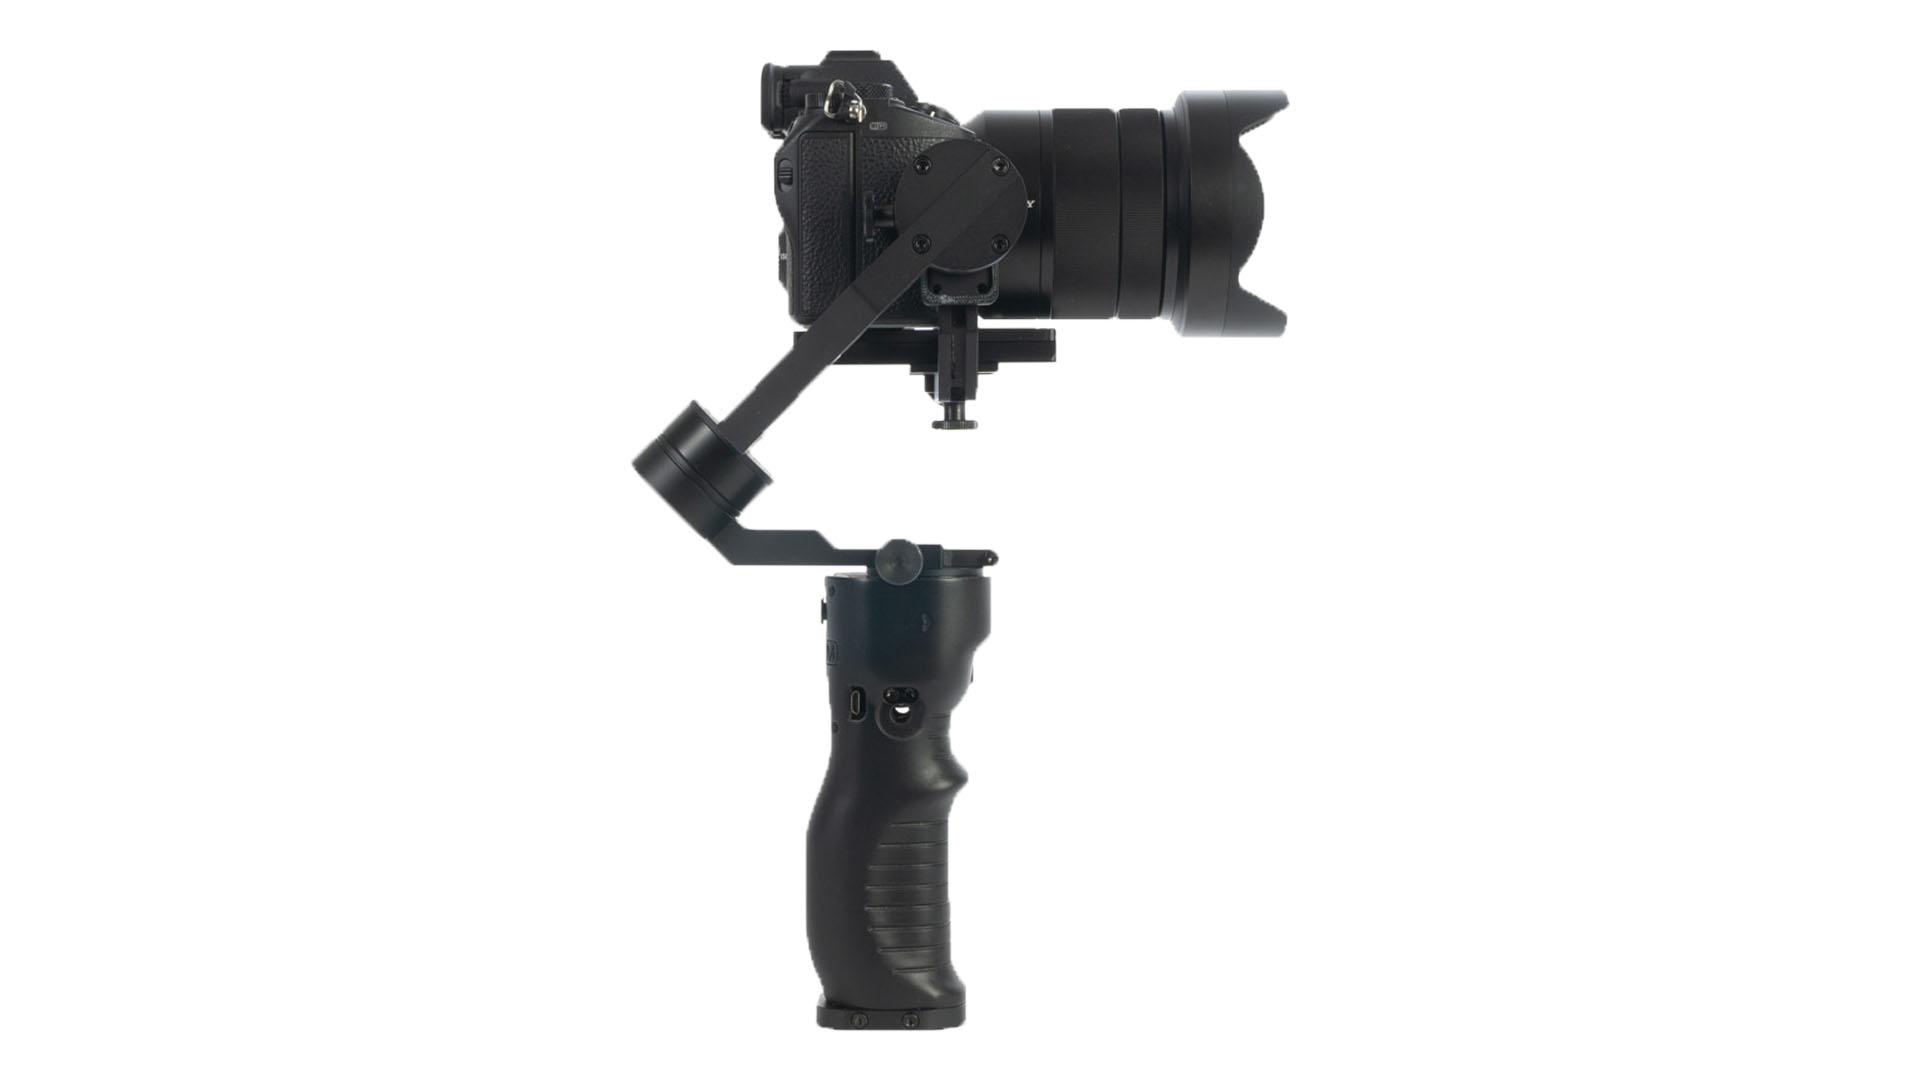 icecam gimbal mini ultravision 1